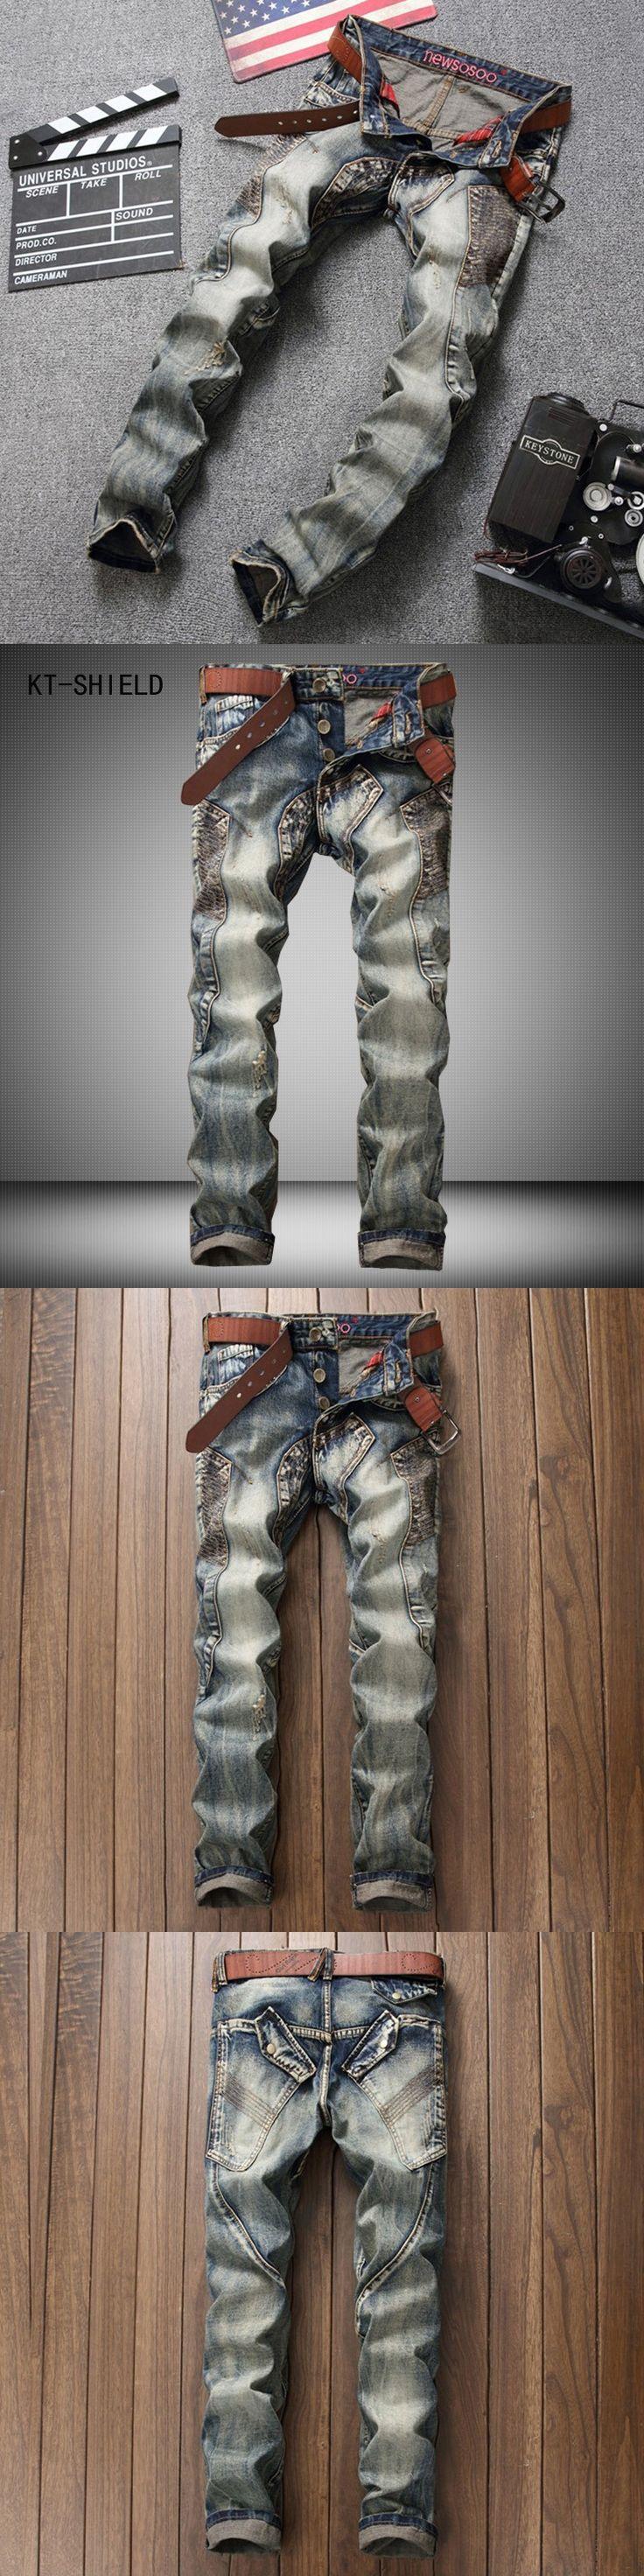 Mens patchwork spliced ripped denim jeans men Vintage Acid Washed Faded Multi-Pockets jeans Military Style Biker Jeans For Men